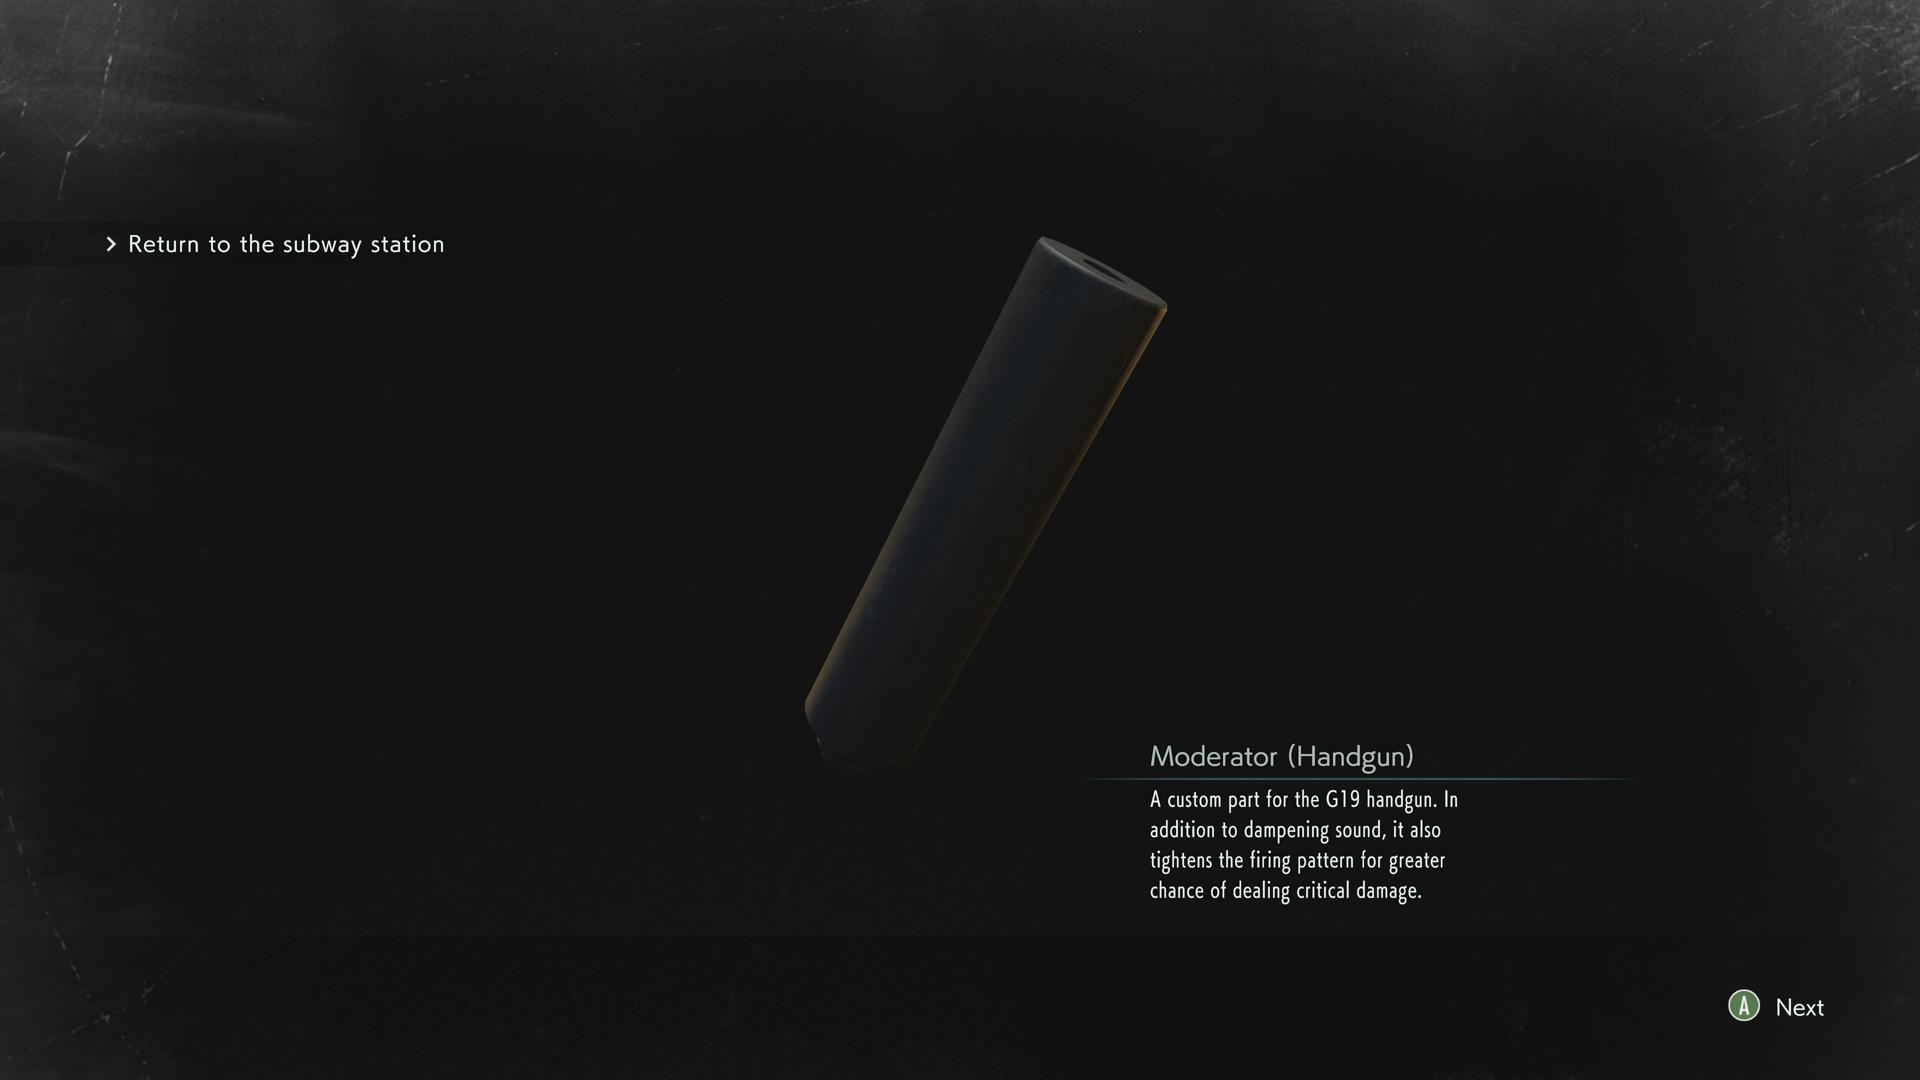 Resident Evil 3 Moderator Handgun location